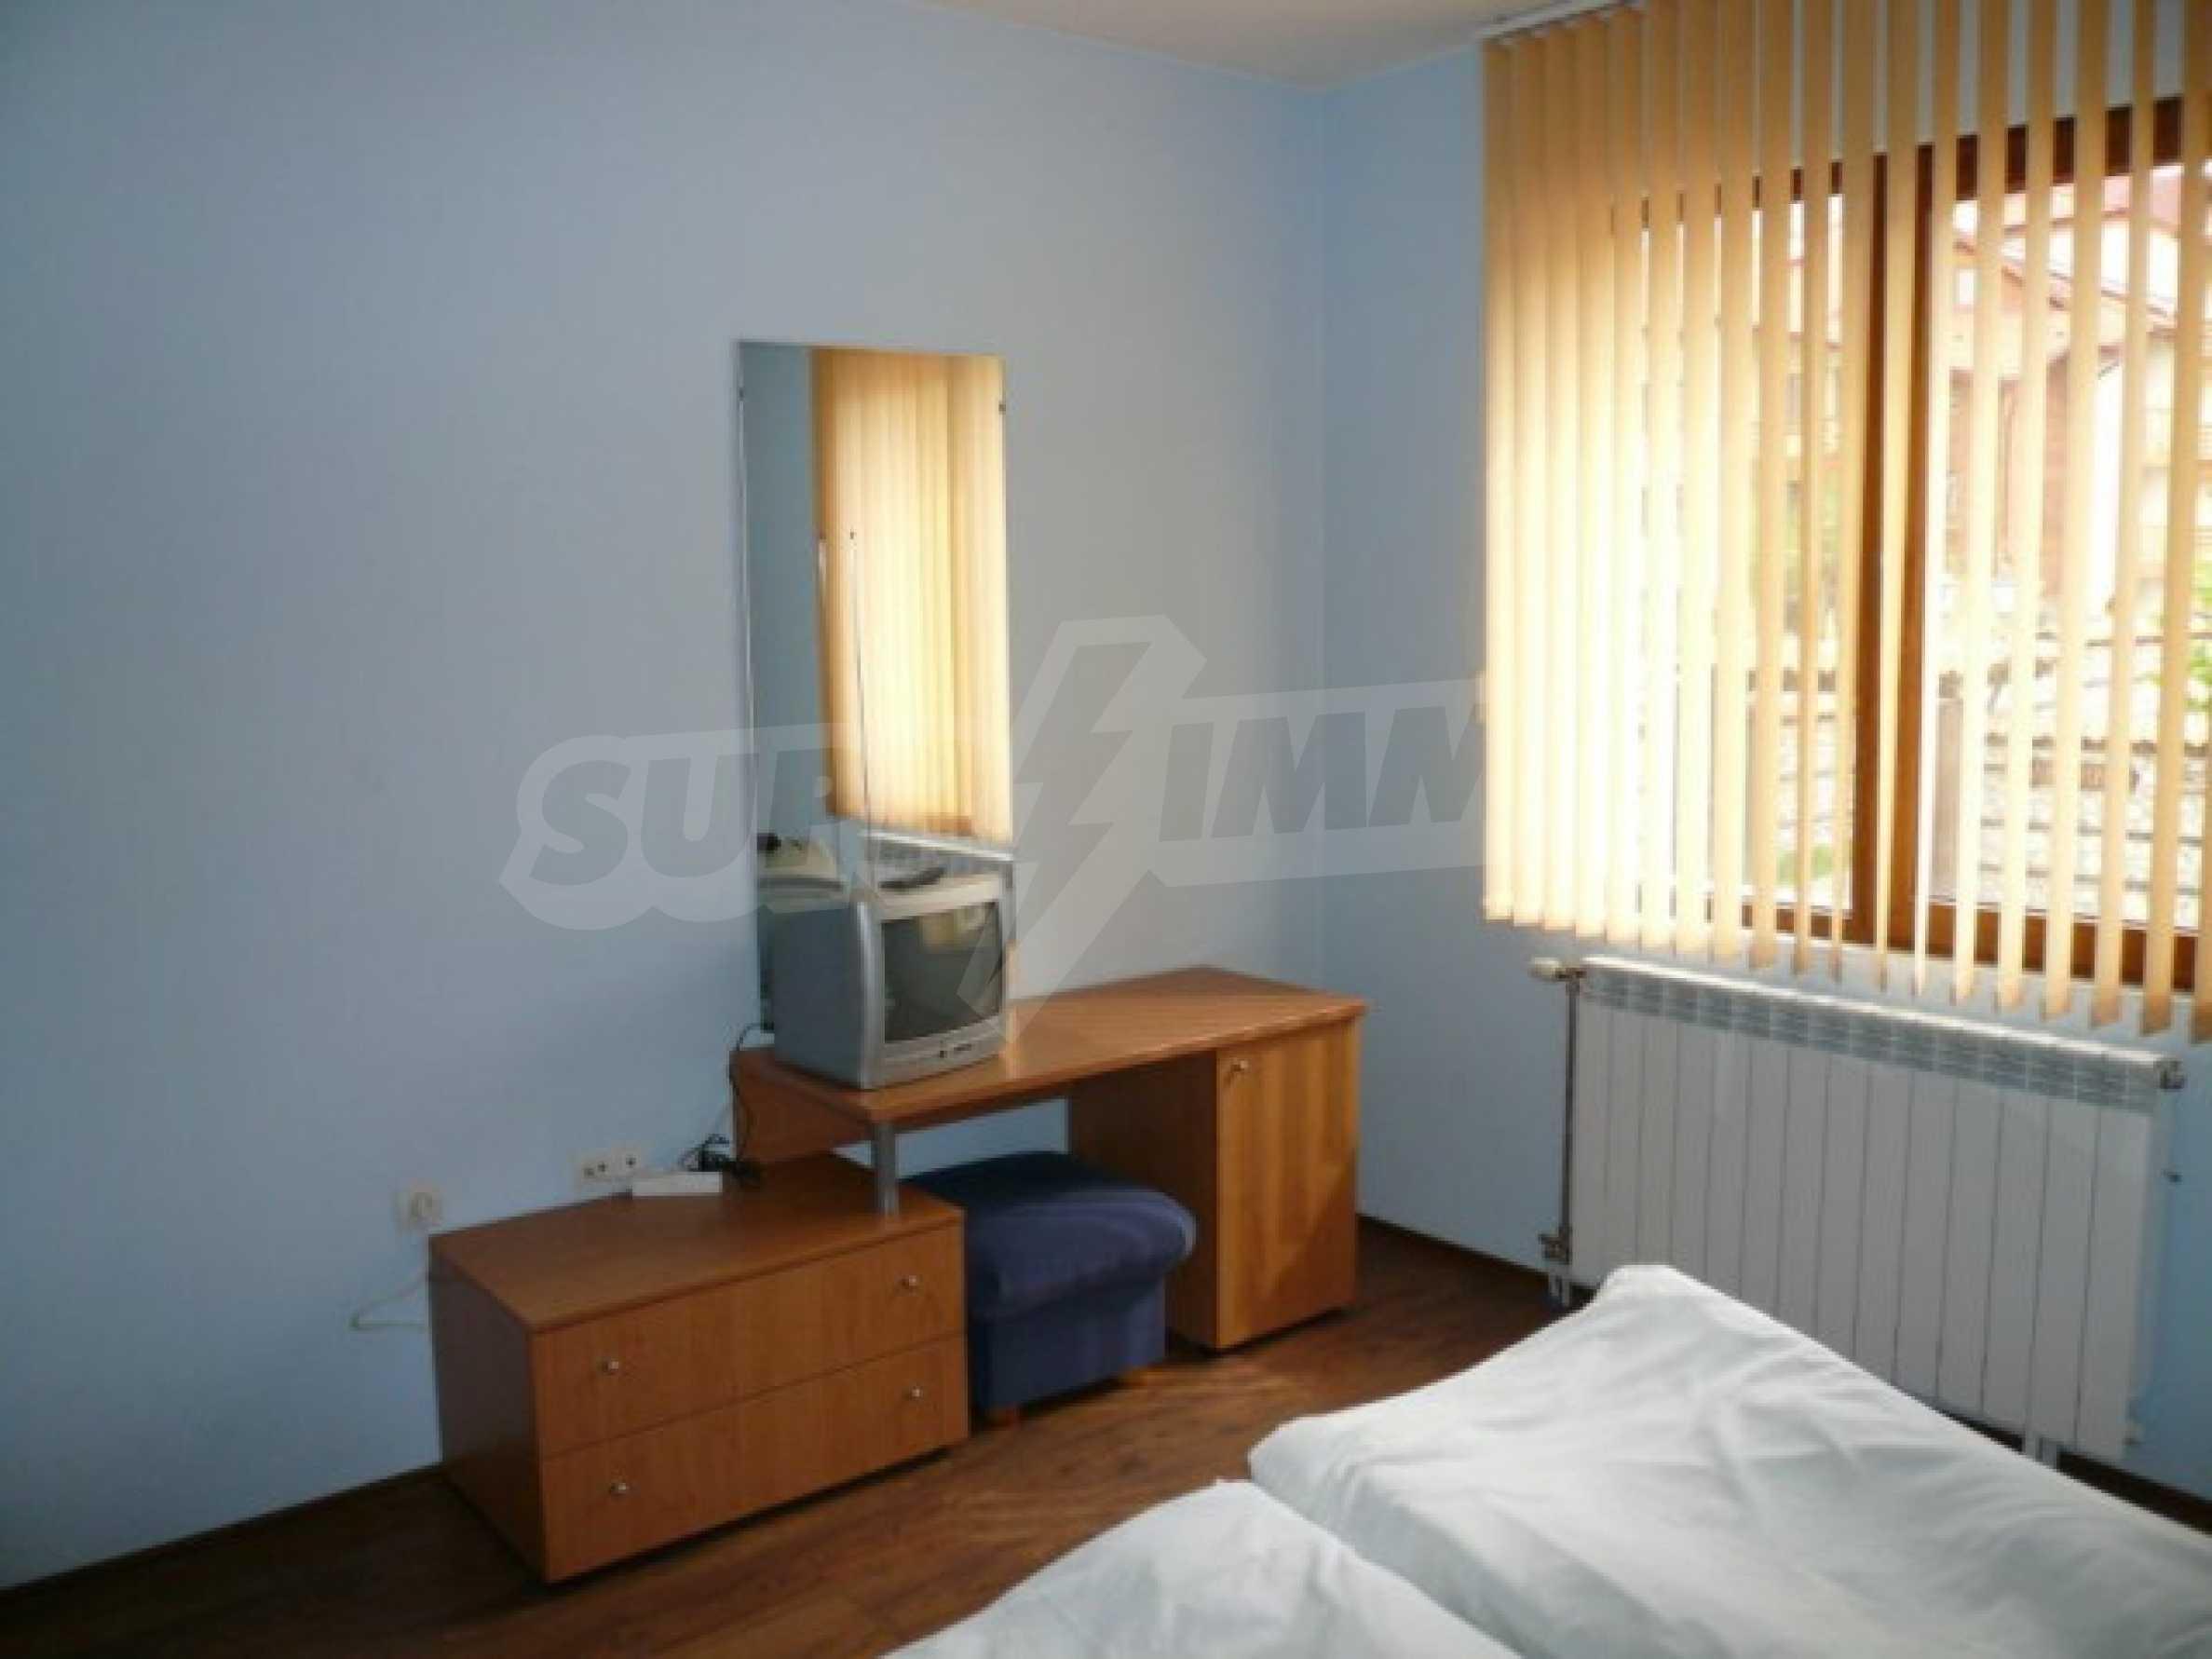 Двустаен апартамент за продажба в гр. Банско 5